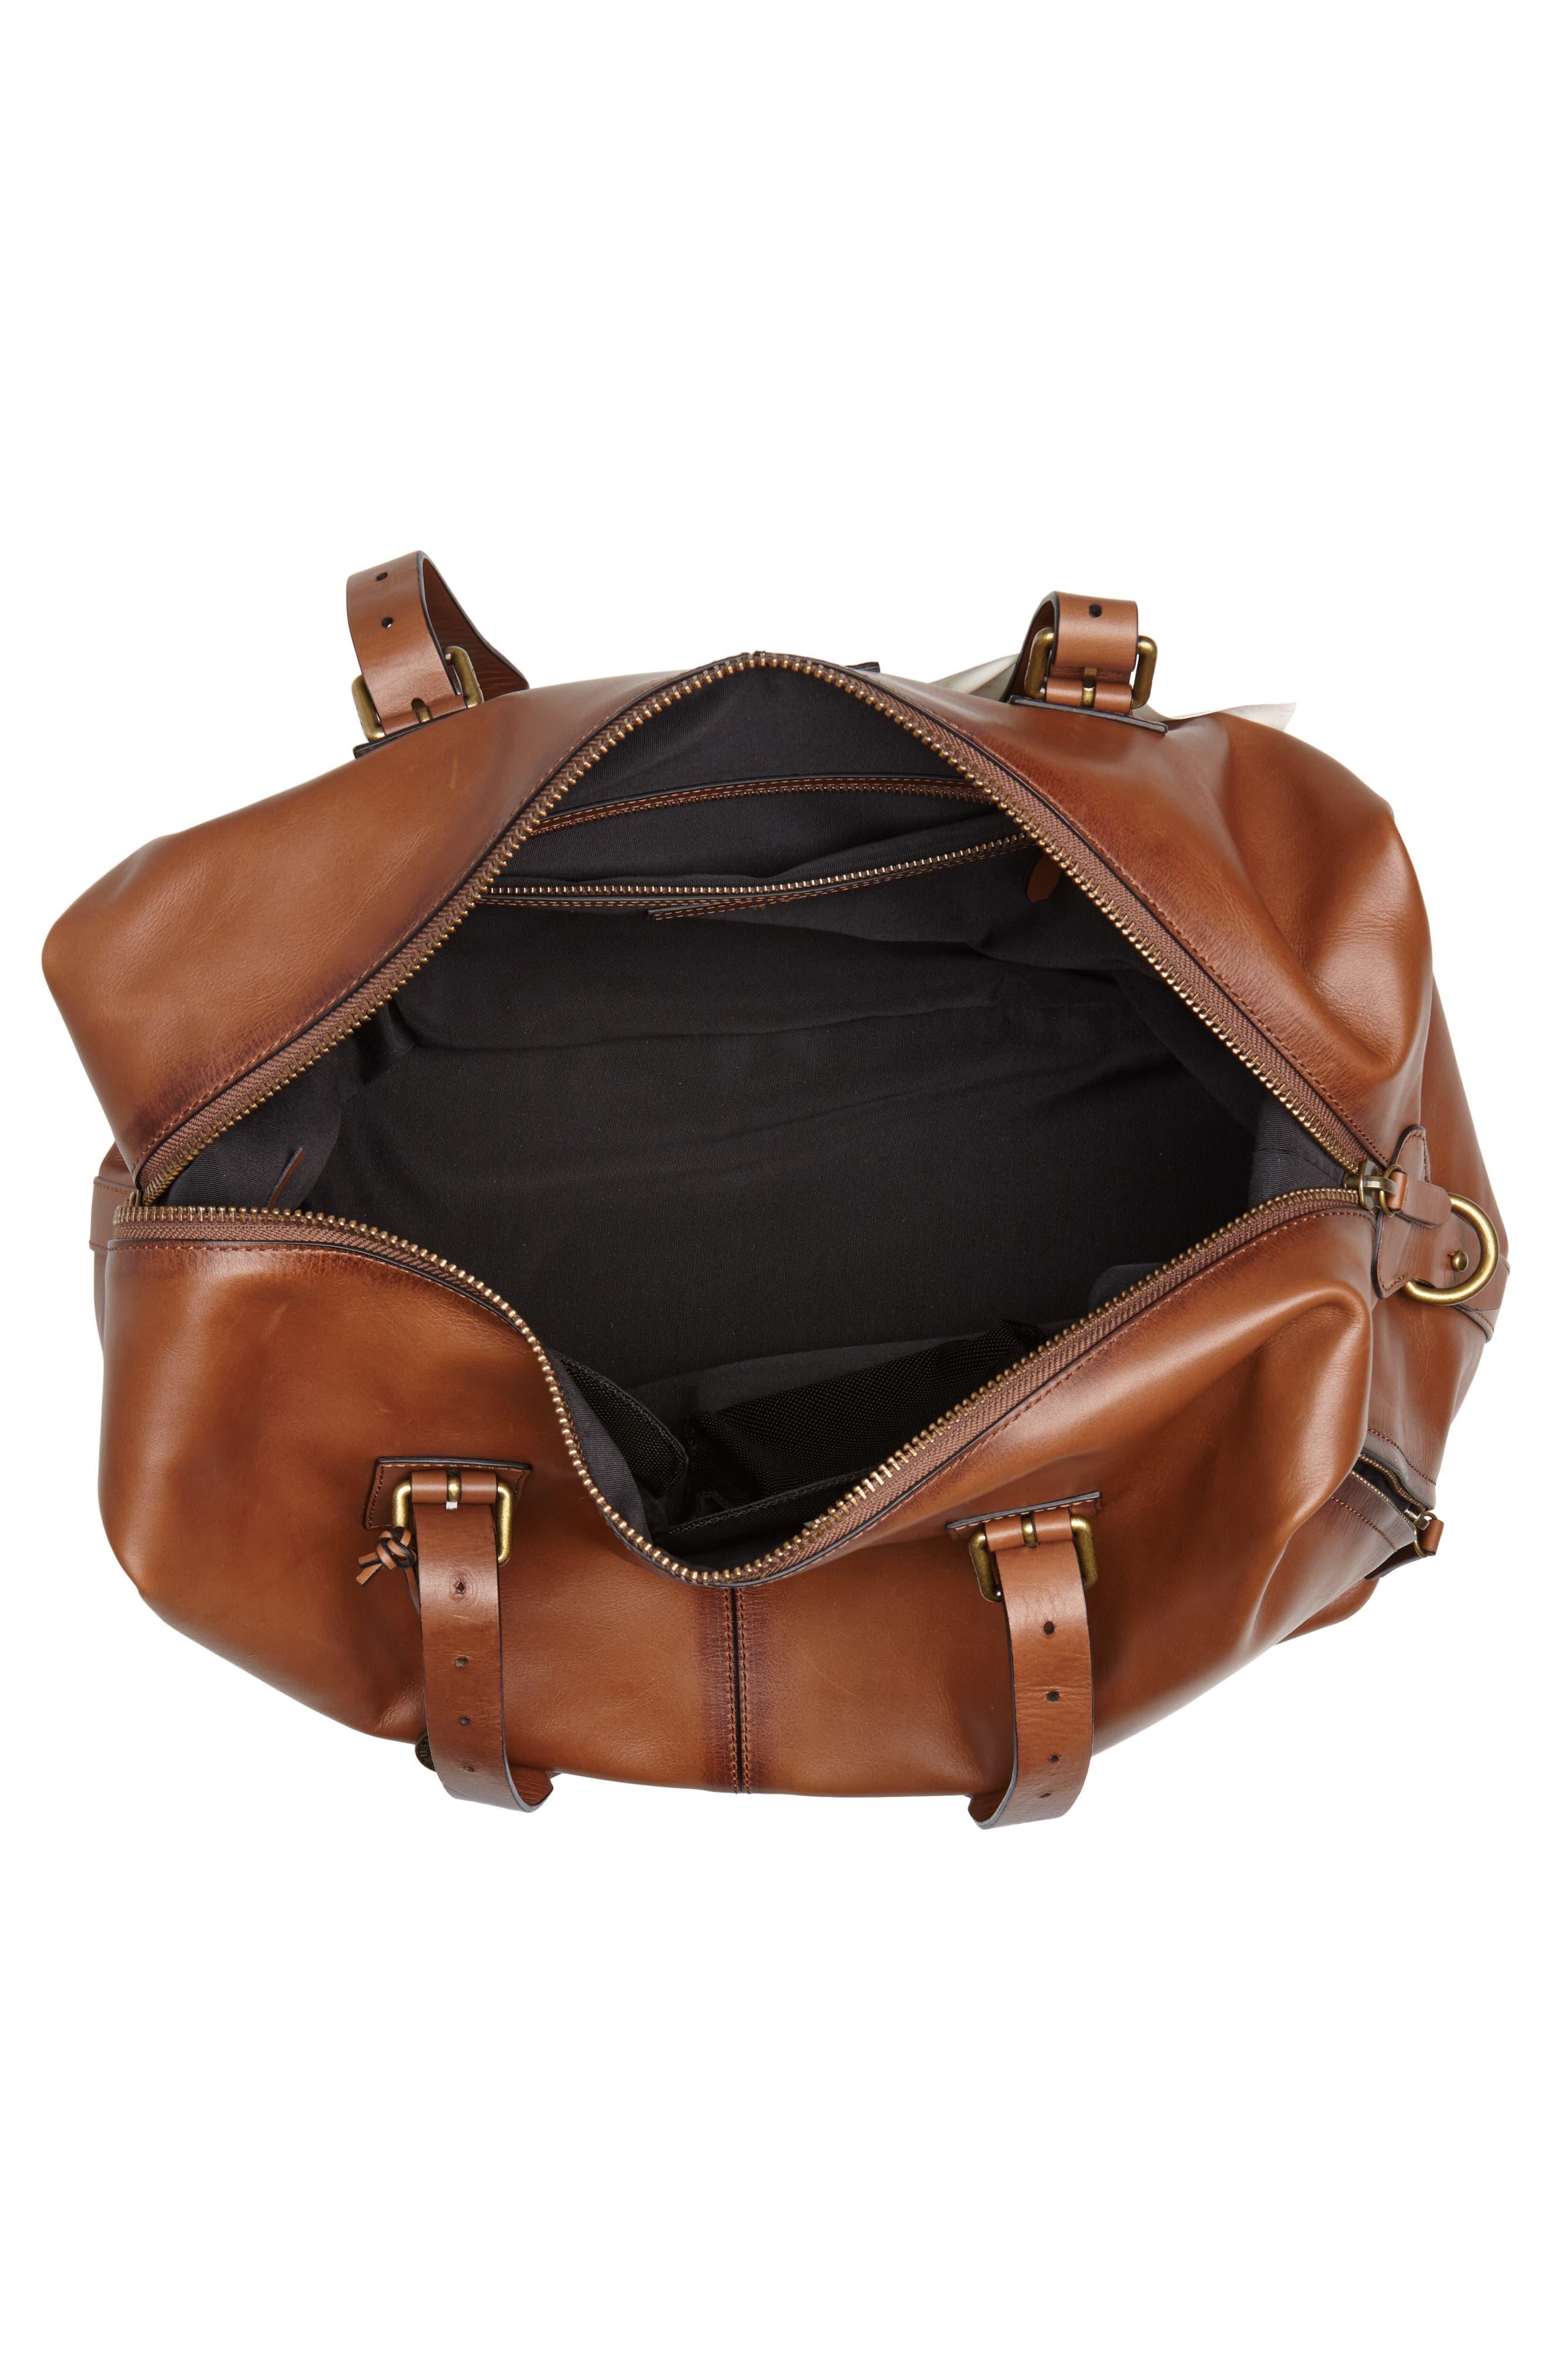 Heritage Leather Duffel Bag,                             Alternate thumbnail 4, color,                             200